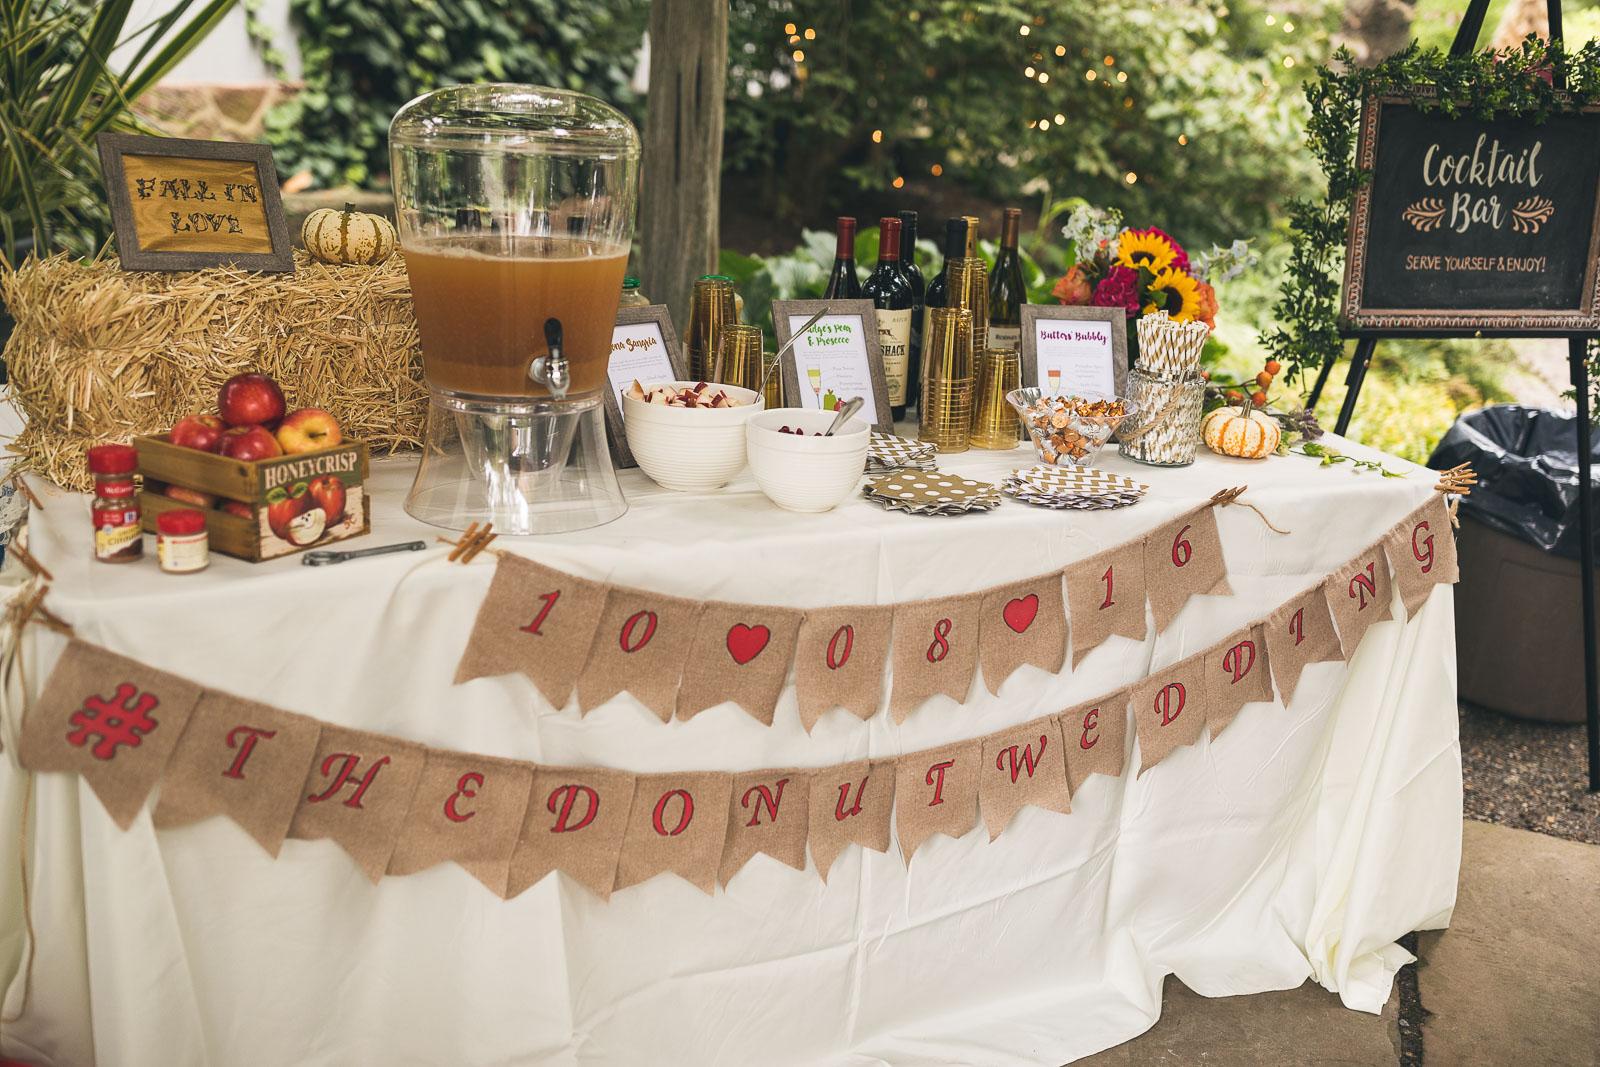 The Donut Wedding